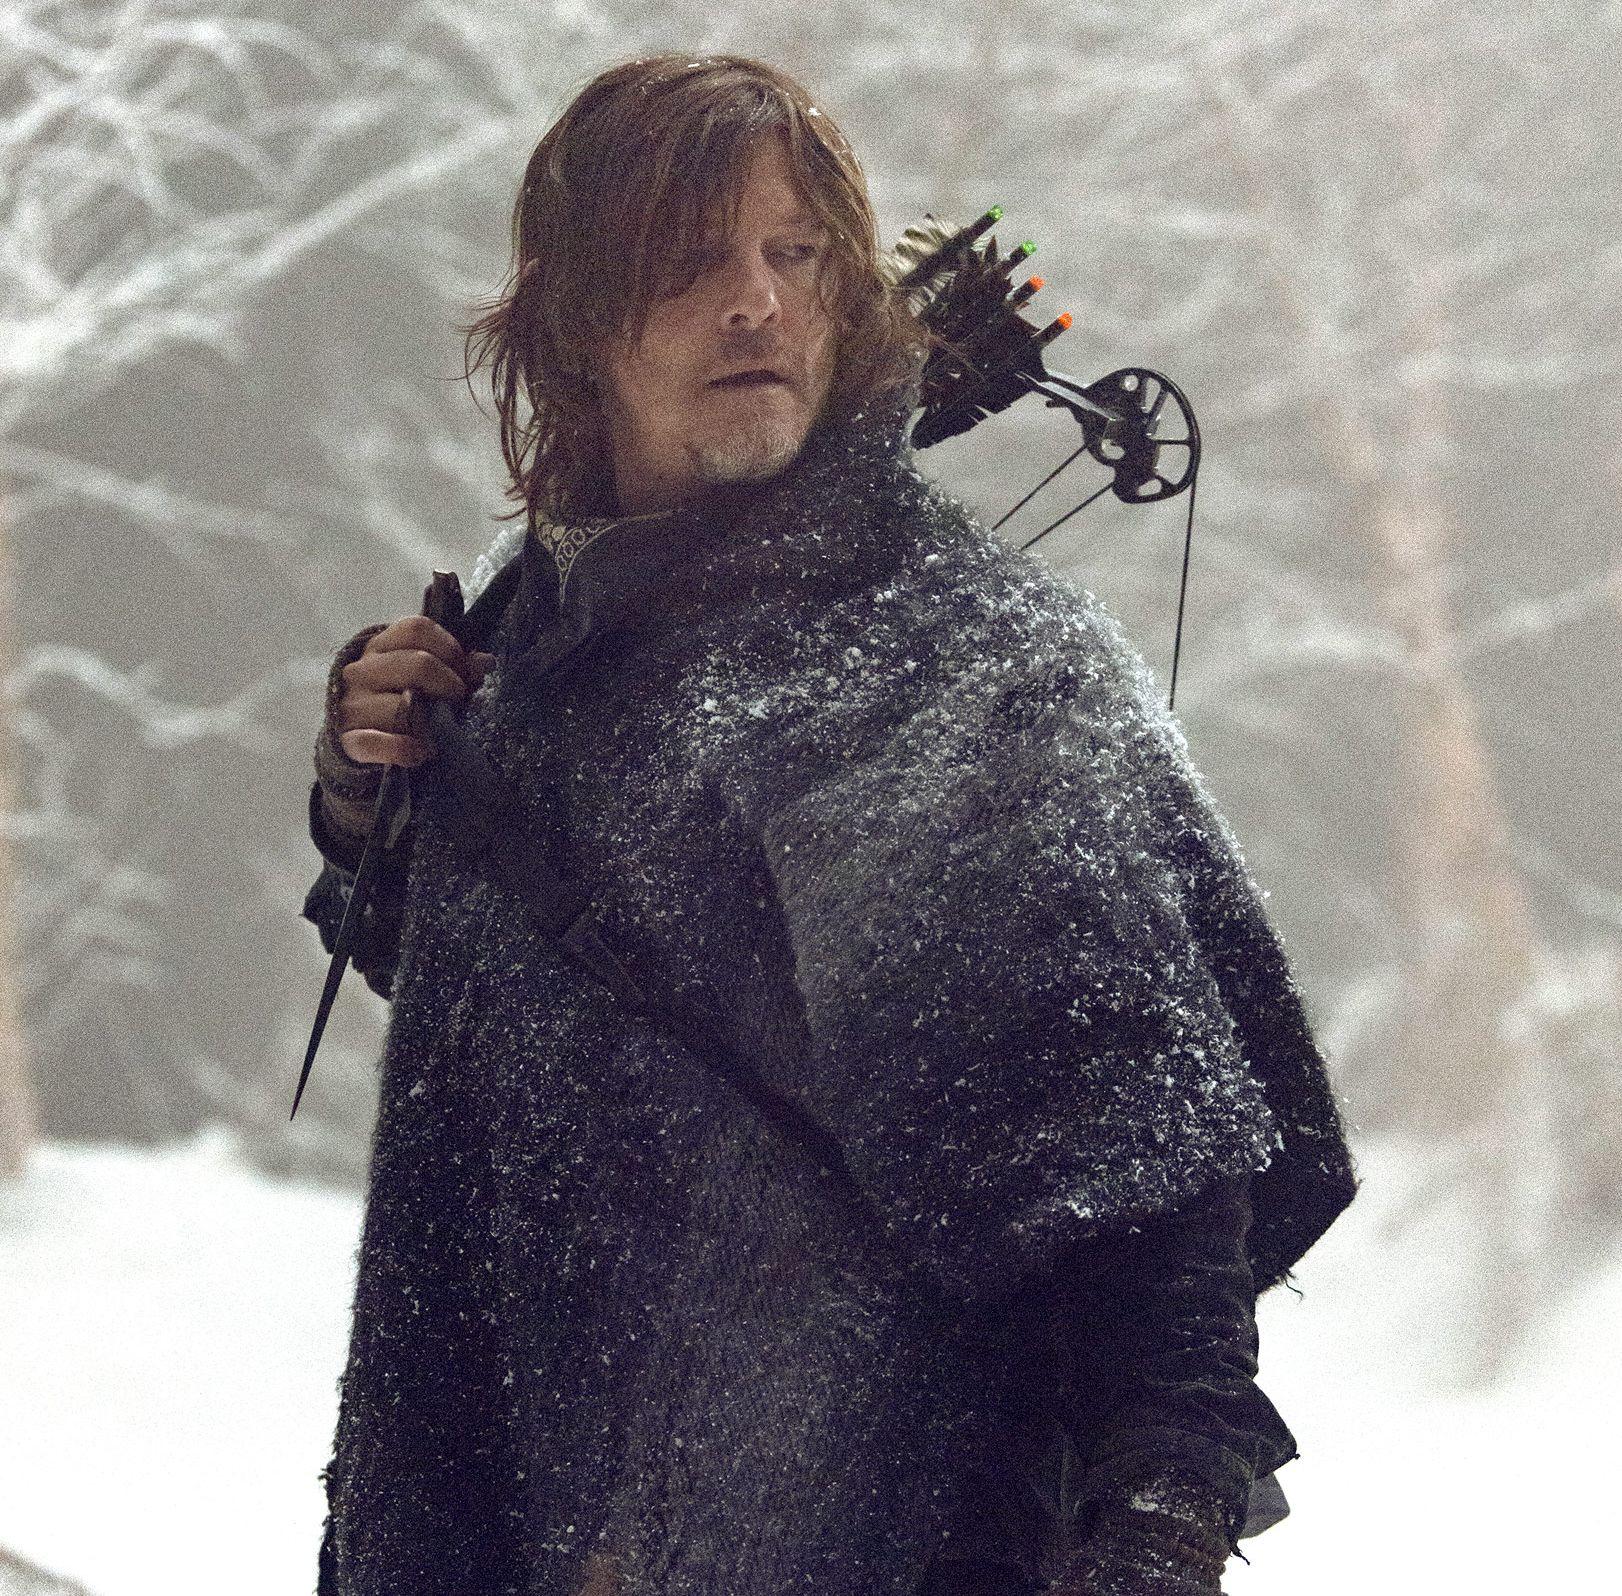 The Walking Dead's Norman Reedus confirms filming has begun on season 10